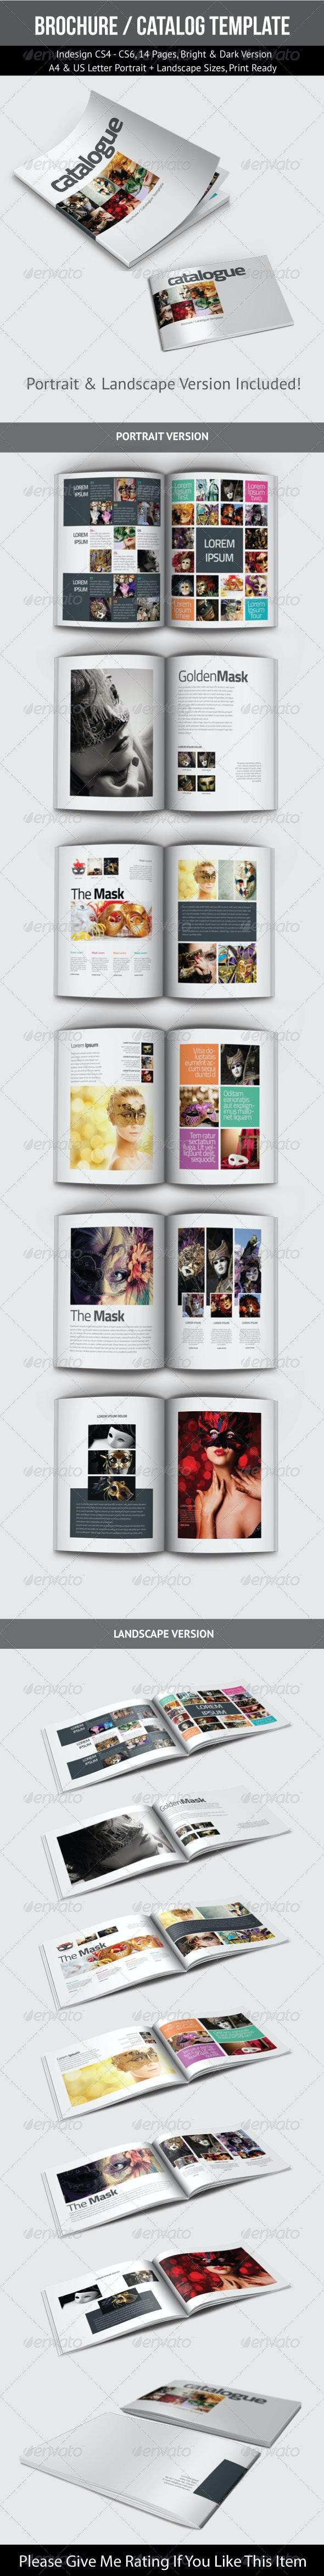 Brochure / Catalog Template - Brochures Print Templates